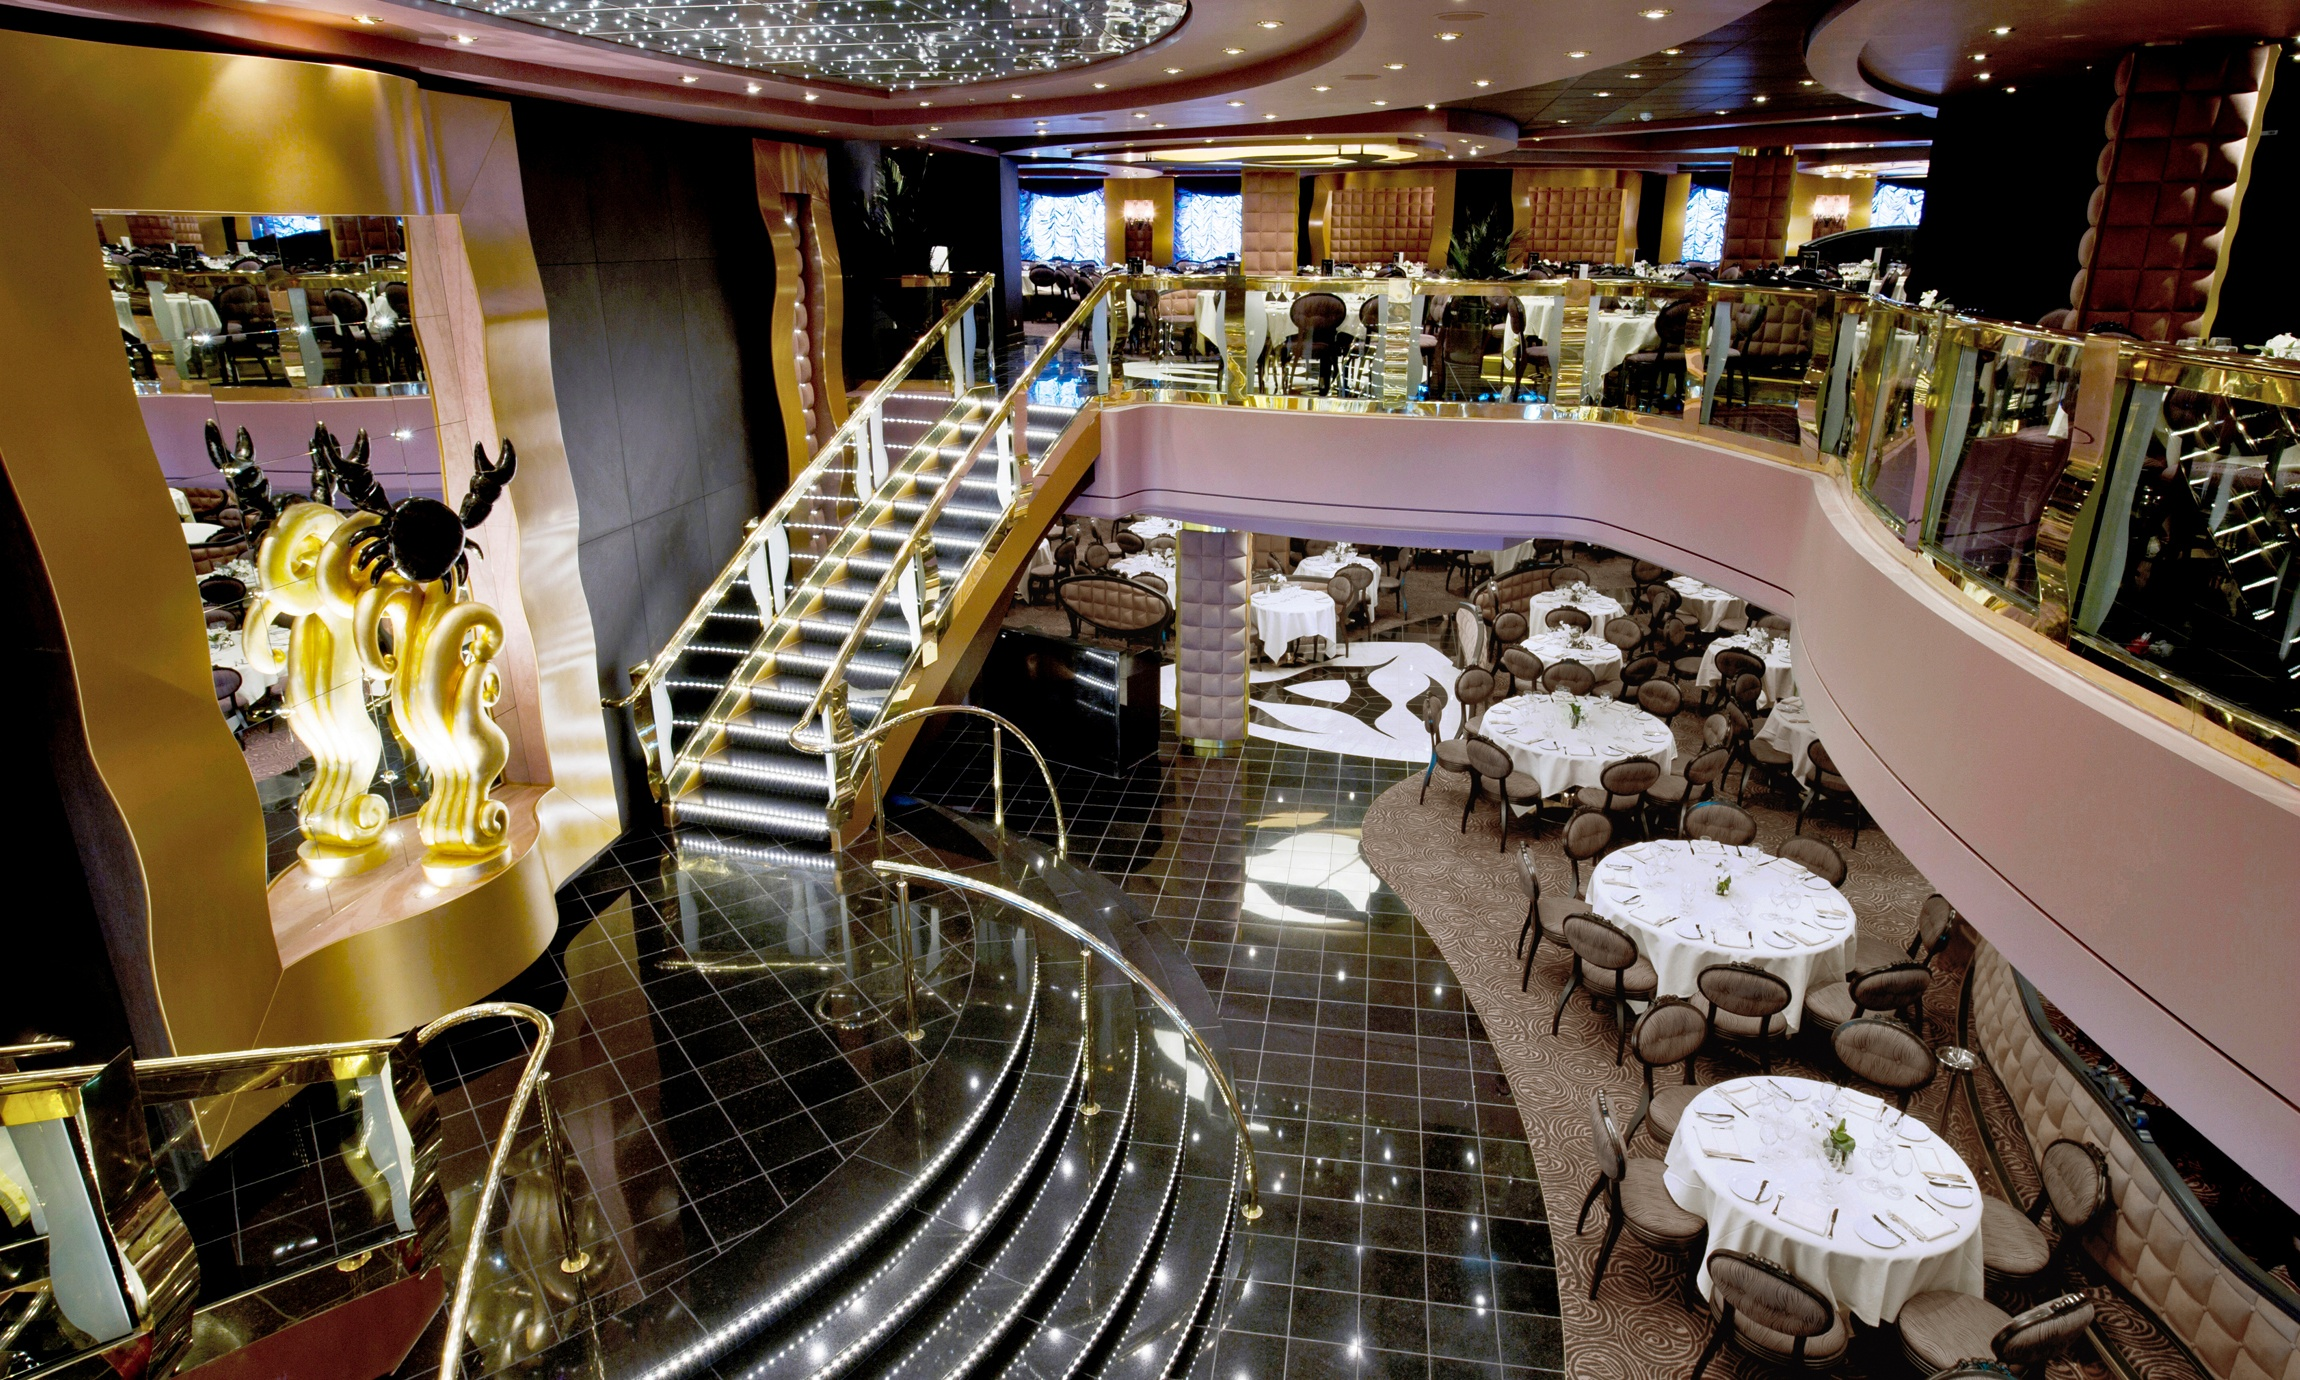 MSC Divina MSC Cruises - Msc divina cruise ship